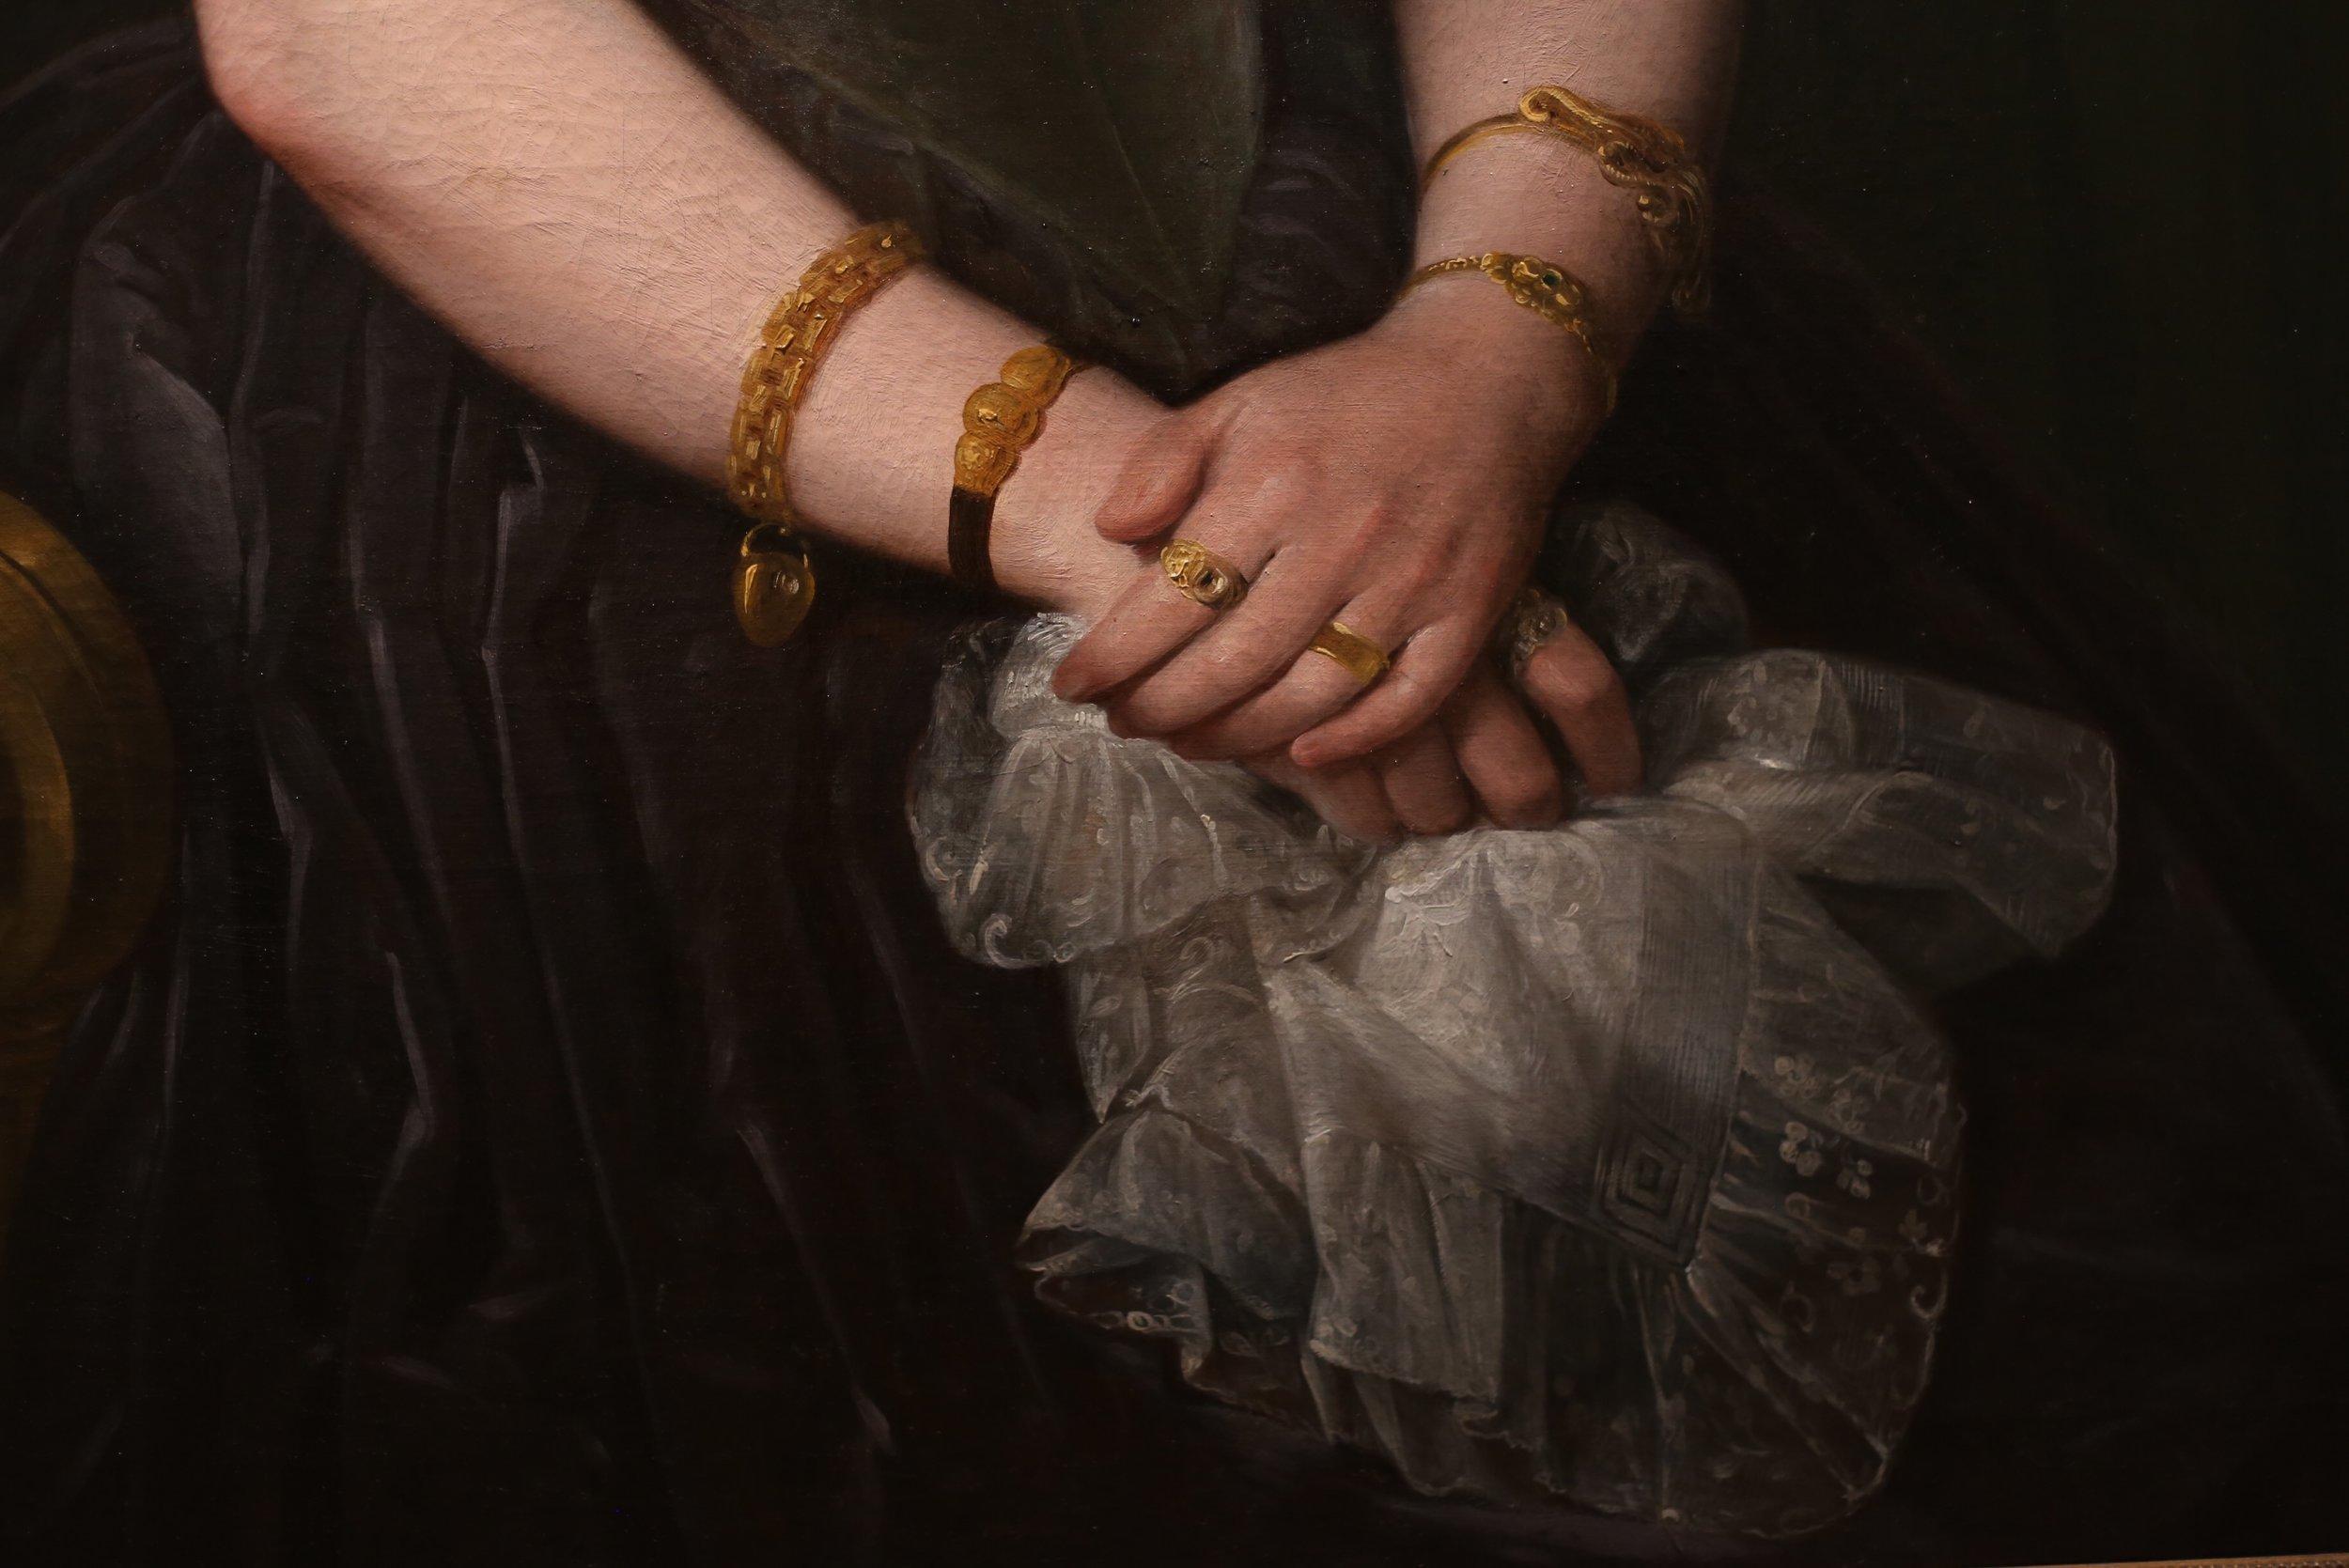 hands painted by Antonio maria esquival